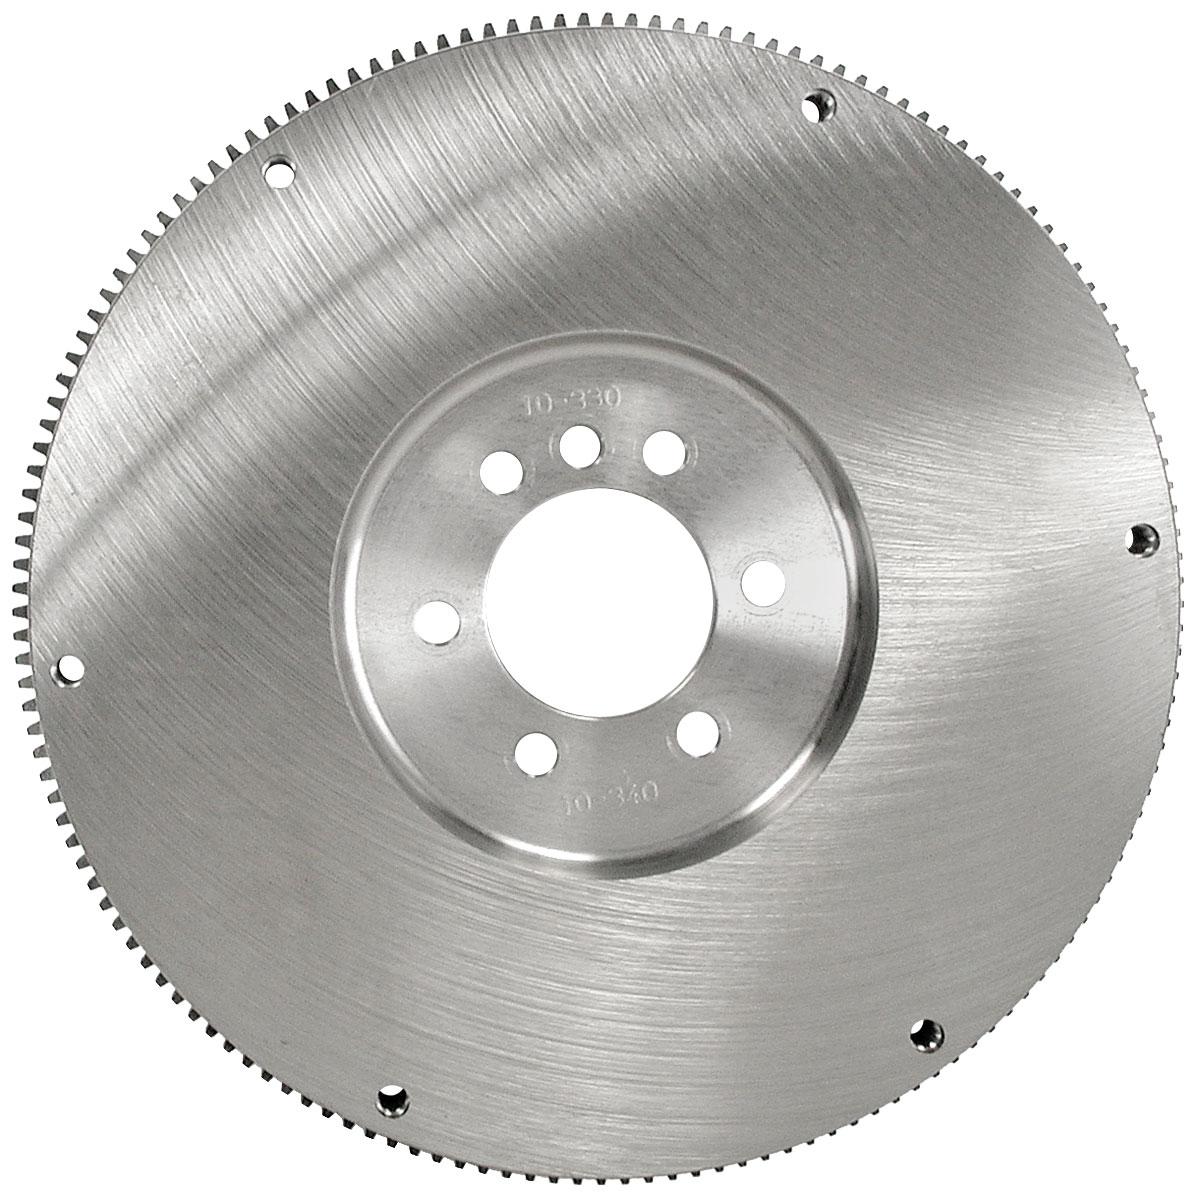 Photo of Flywheels, Billet Steel, Hays 153 Tooth 30lb., V8, int. bal.